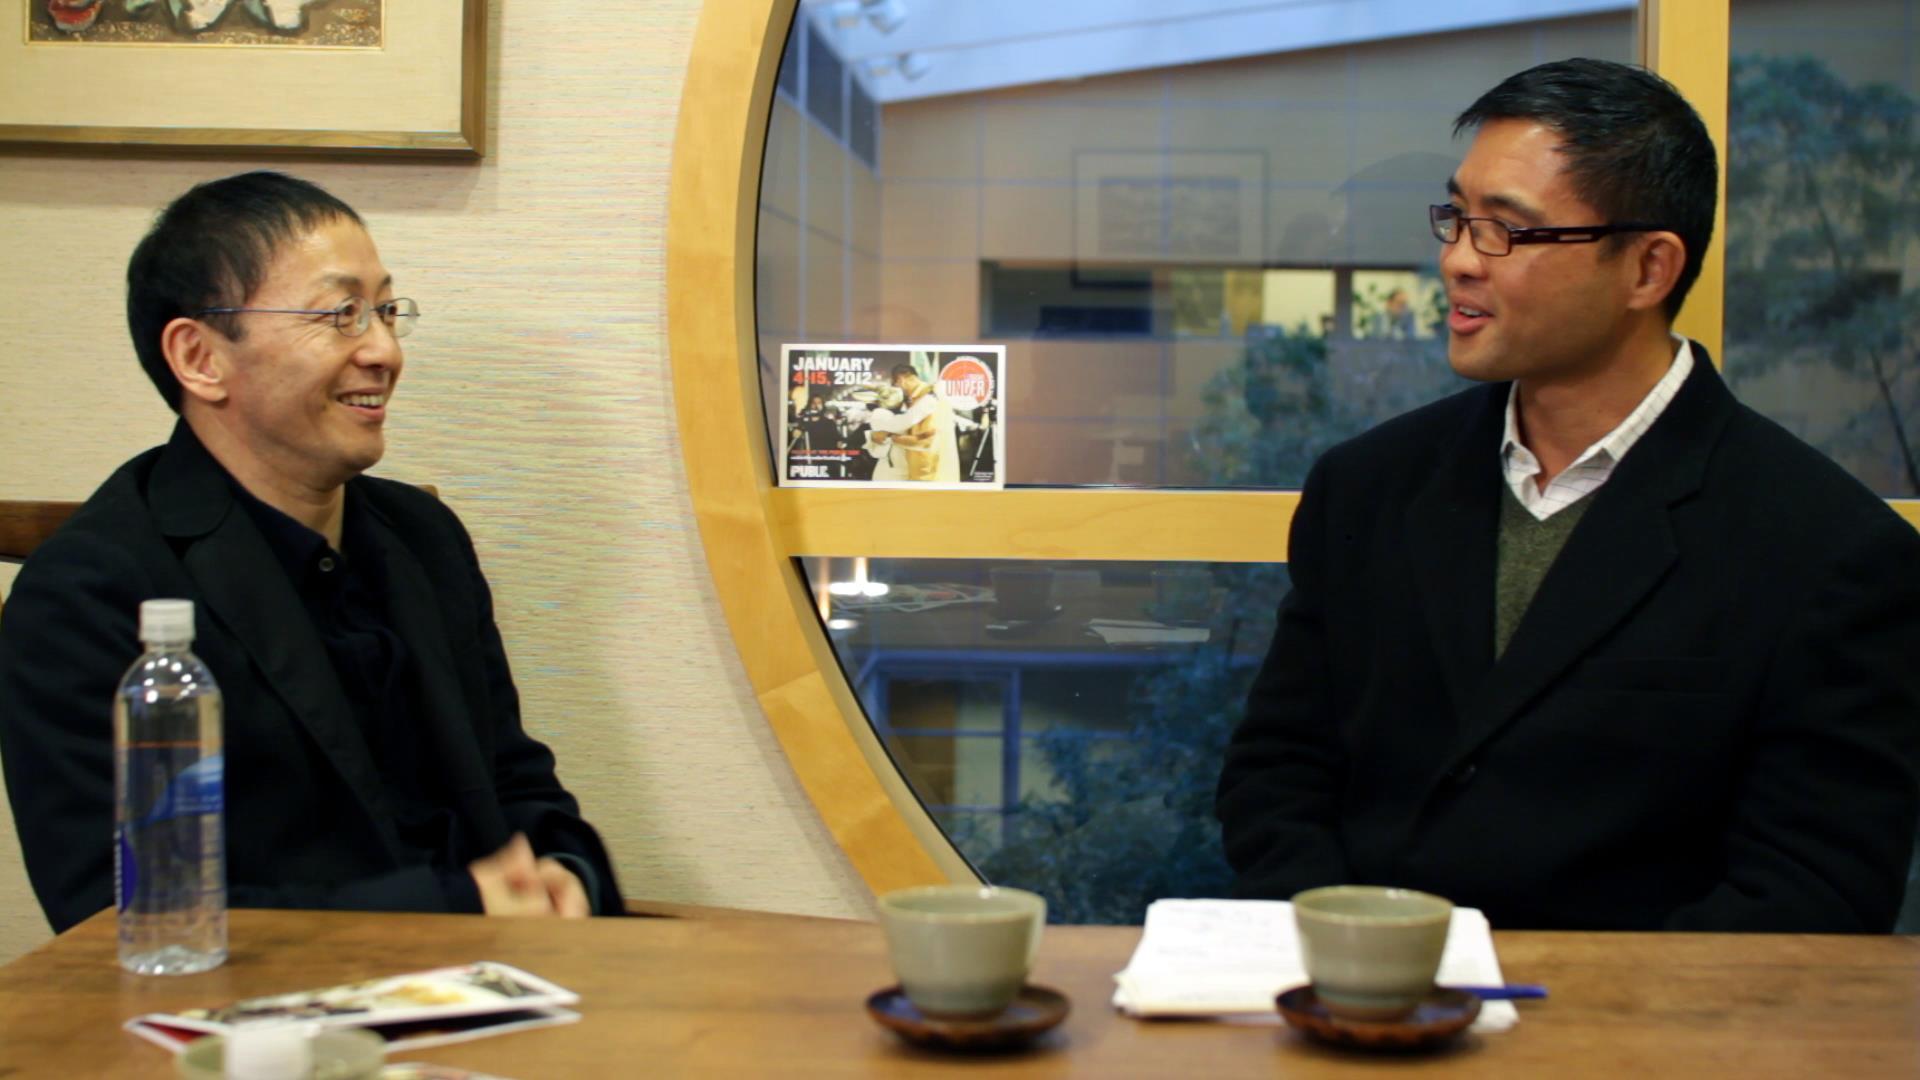 Hideki Noda and Randy Gener in conversation at the Japan Society